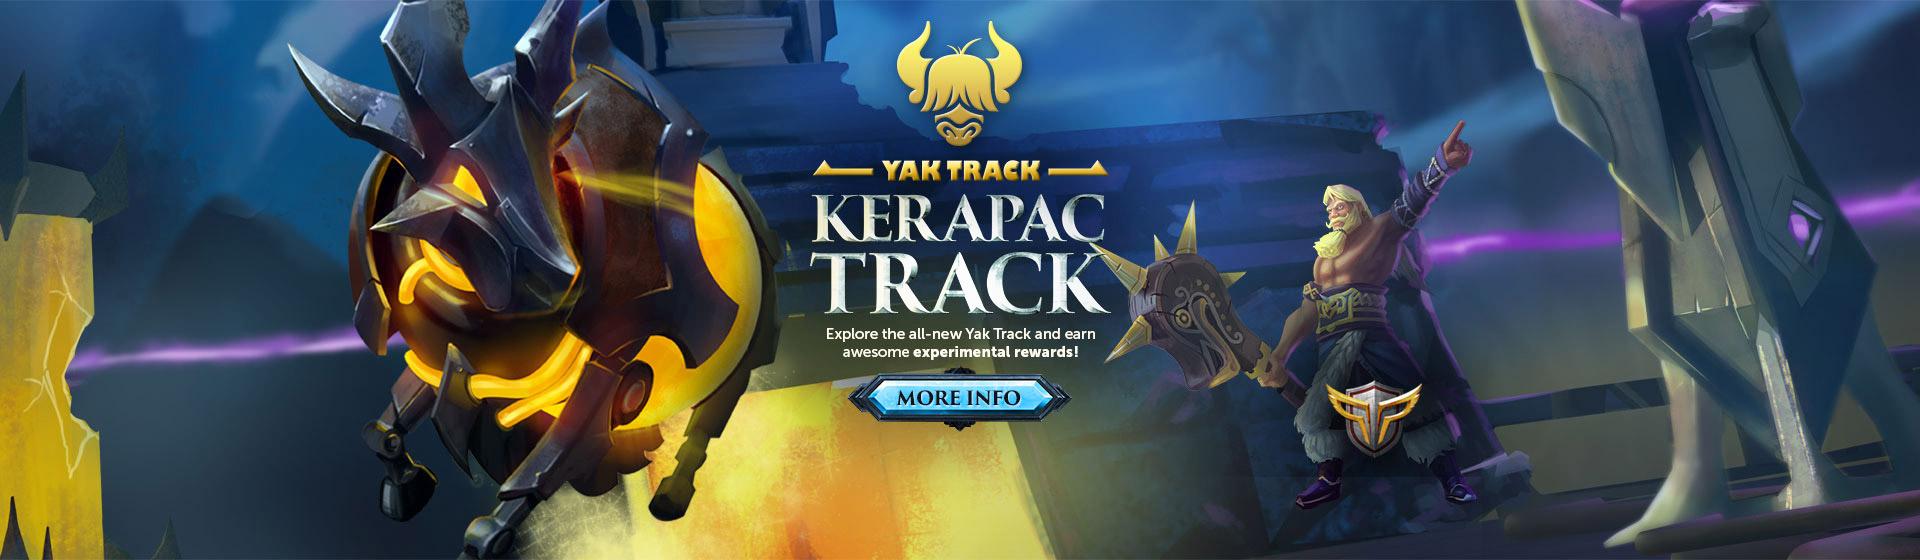 Kerapac-Track